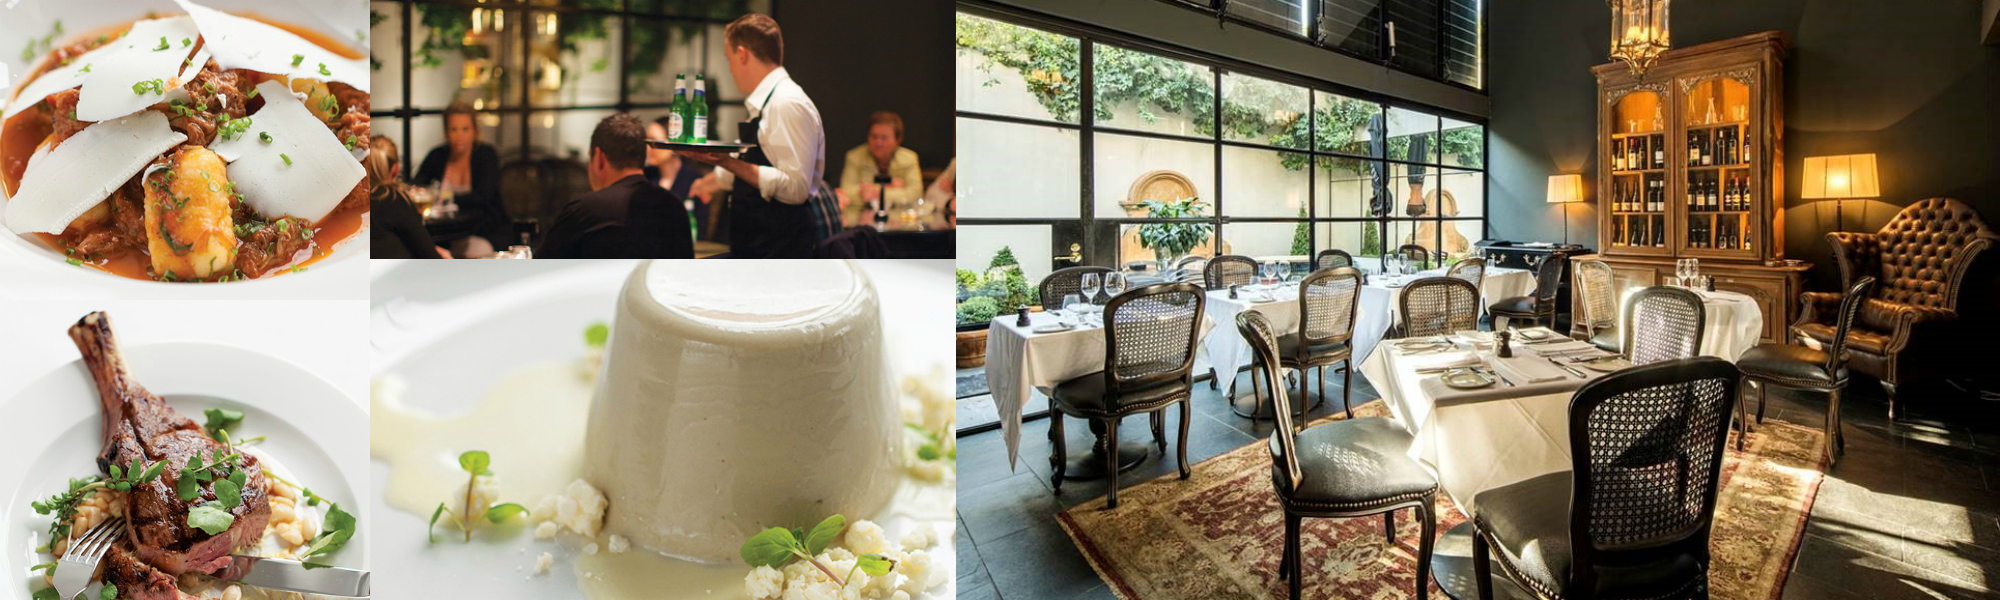 Sth Yarra Restaurant opportunity – Unbeatable Main Rd location!  (Ref V933)